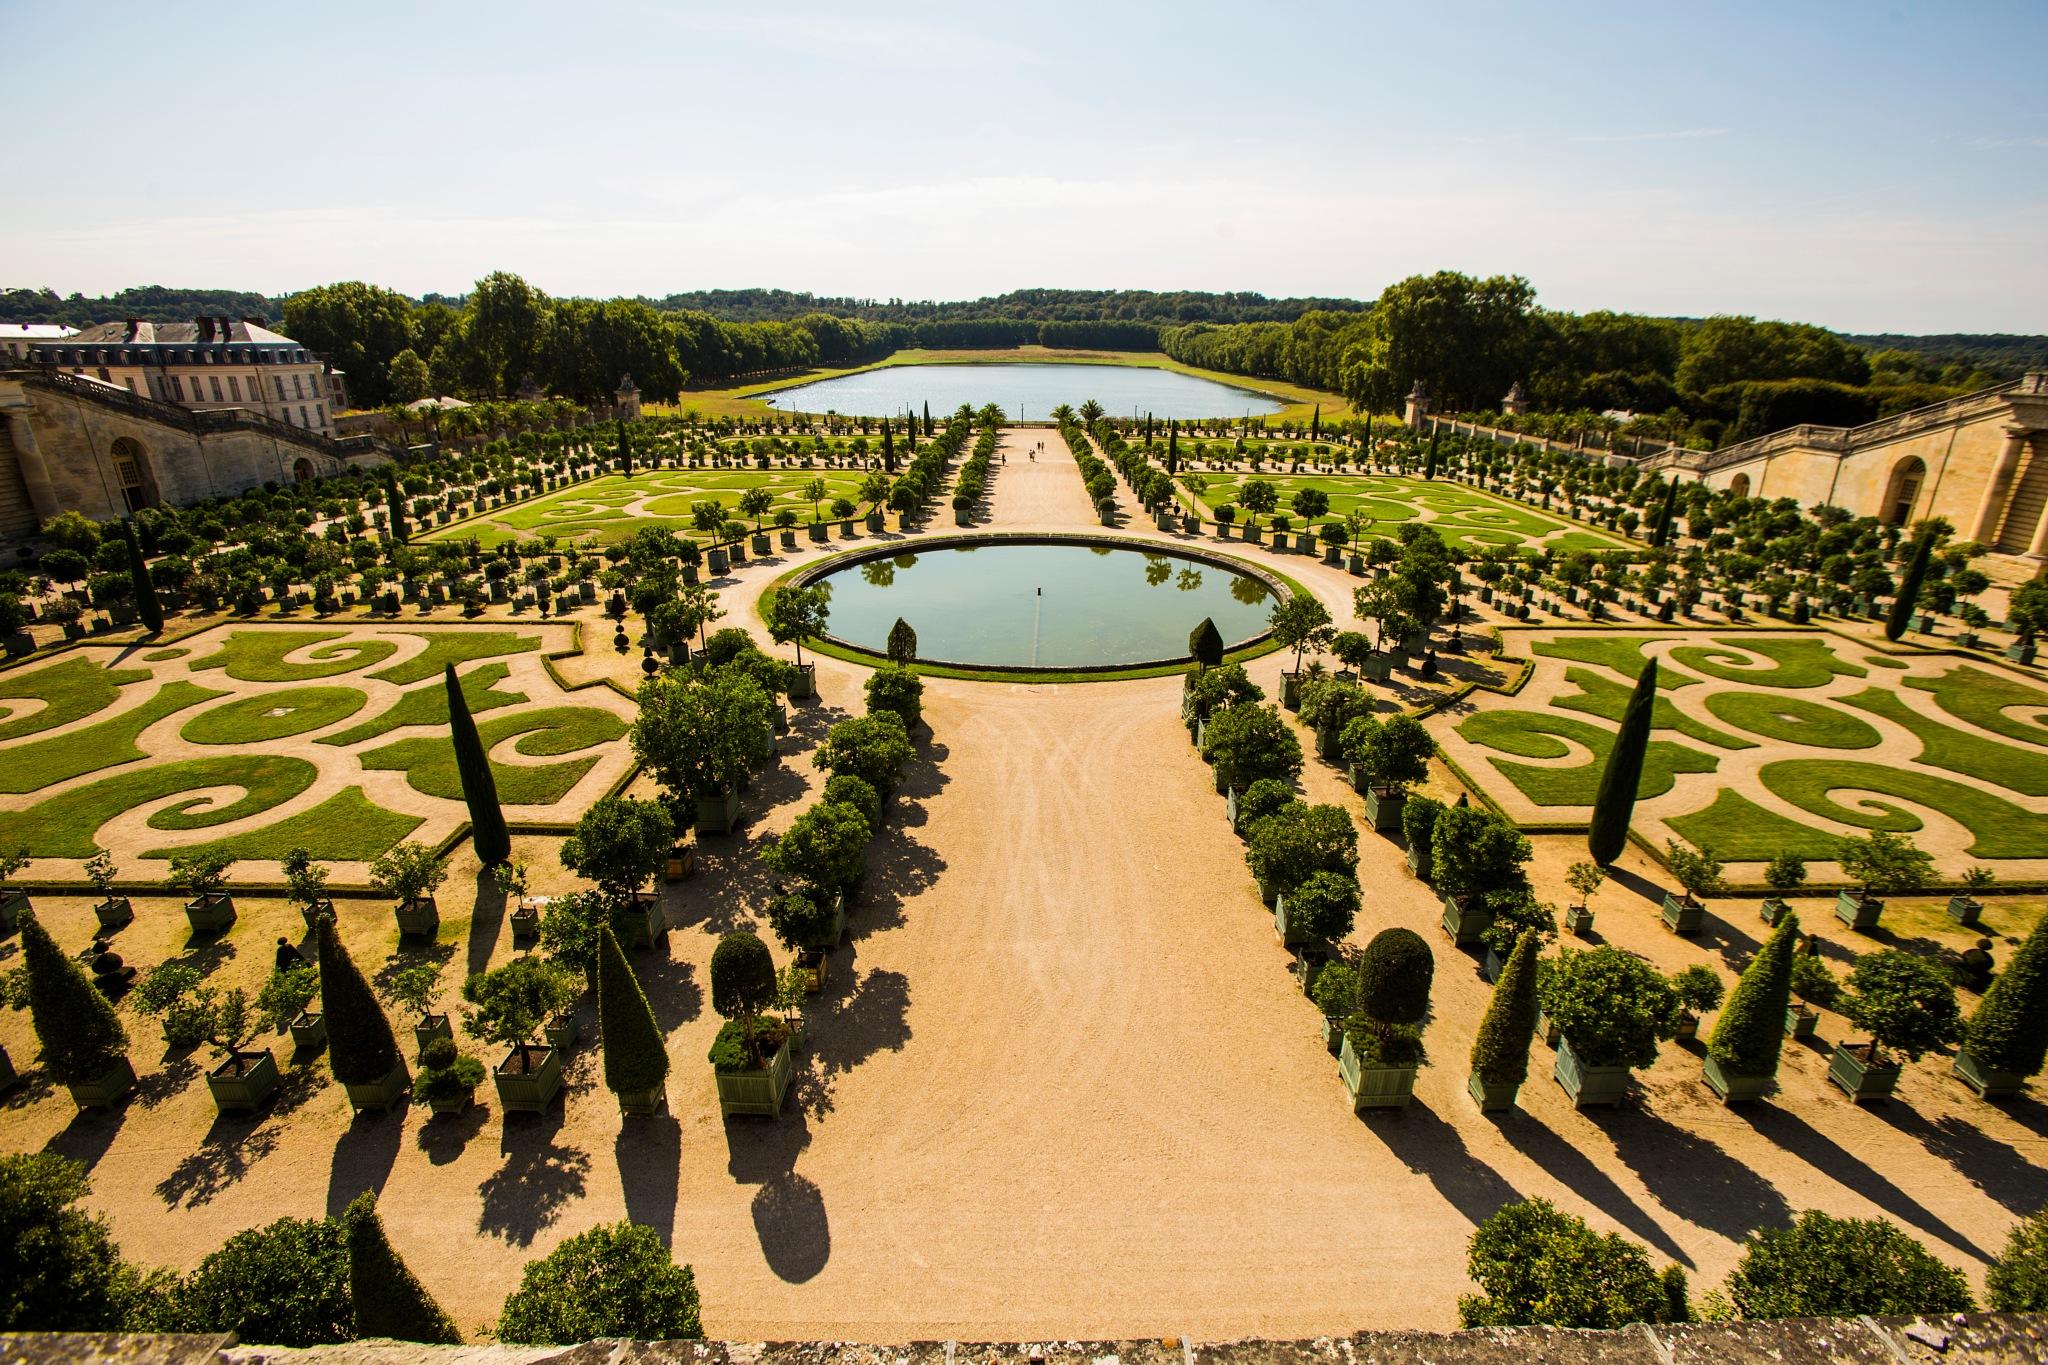 Versailles by Davide 'Dado Dalle Ave